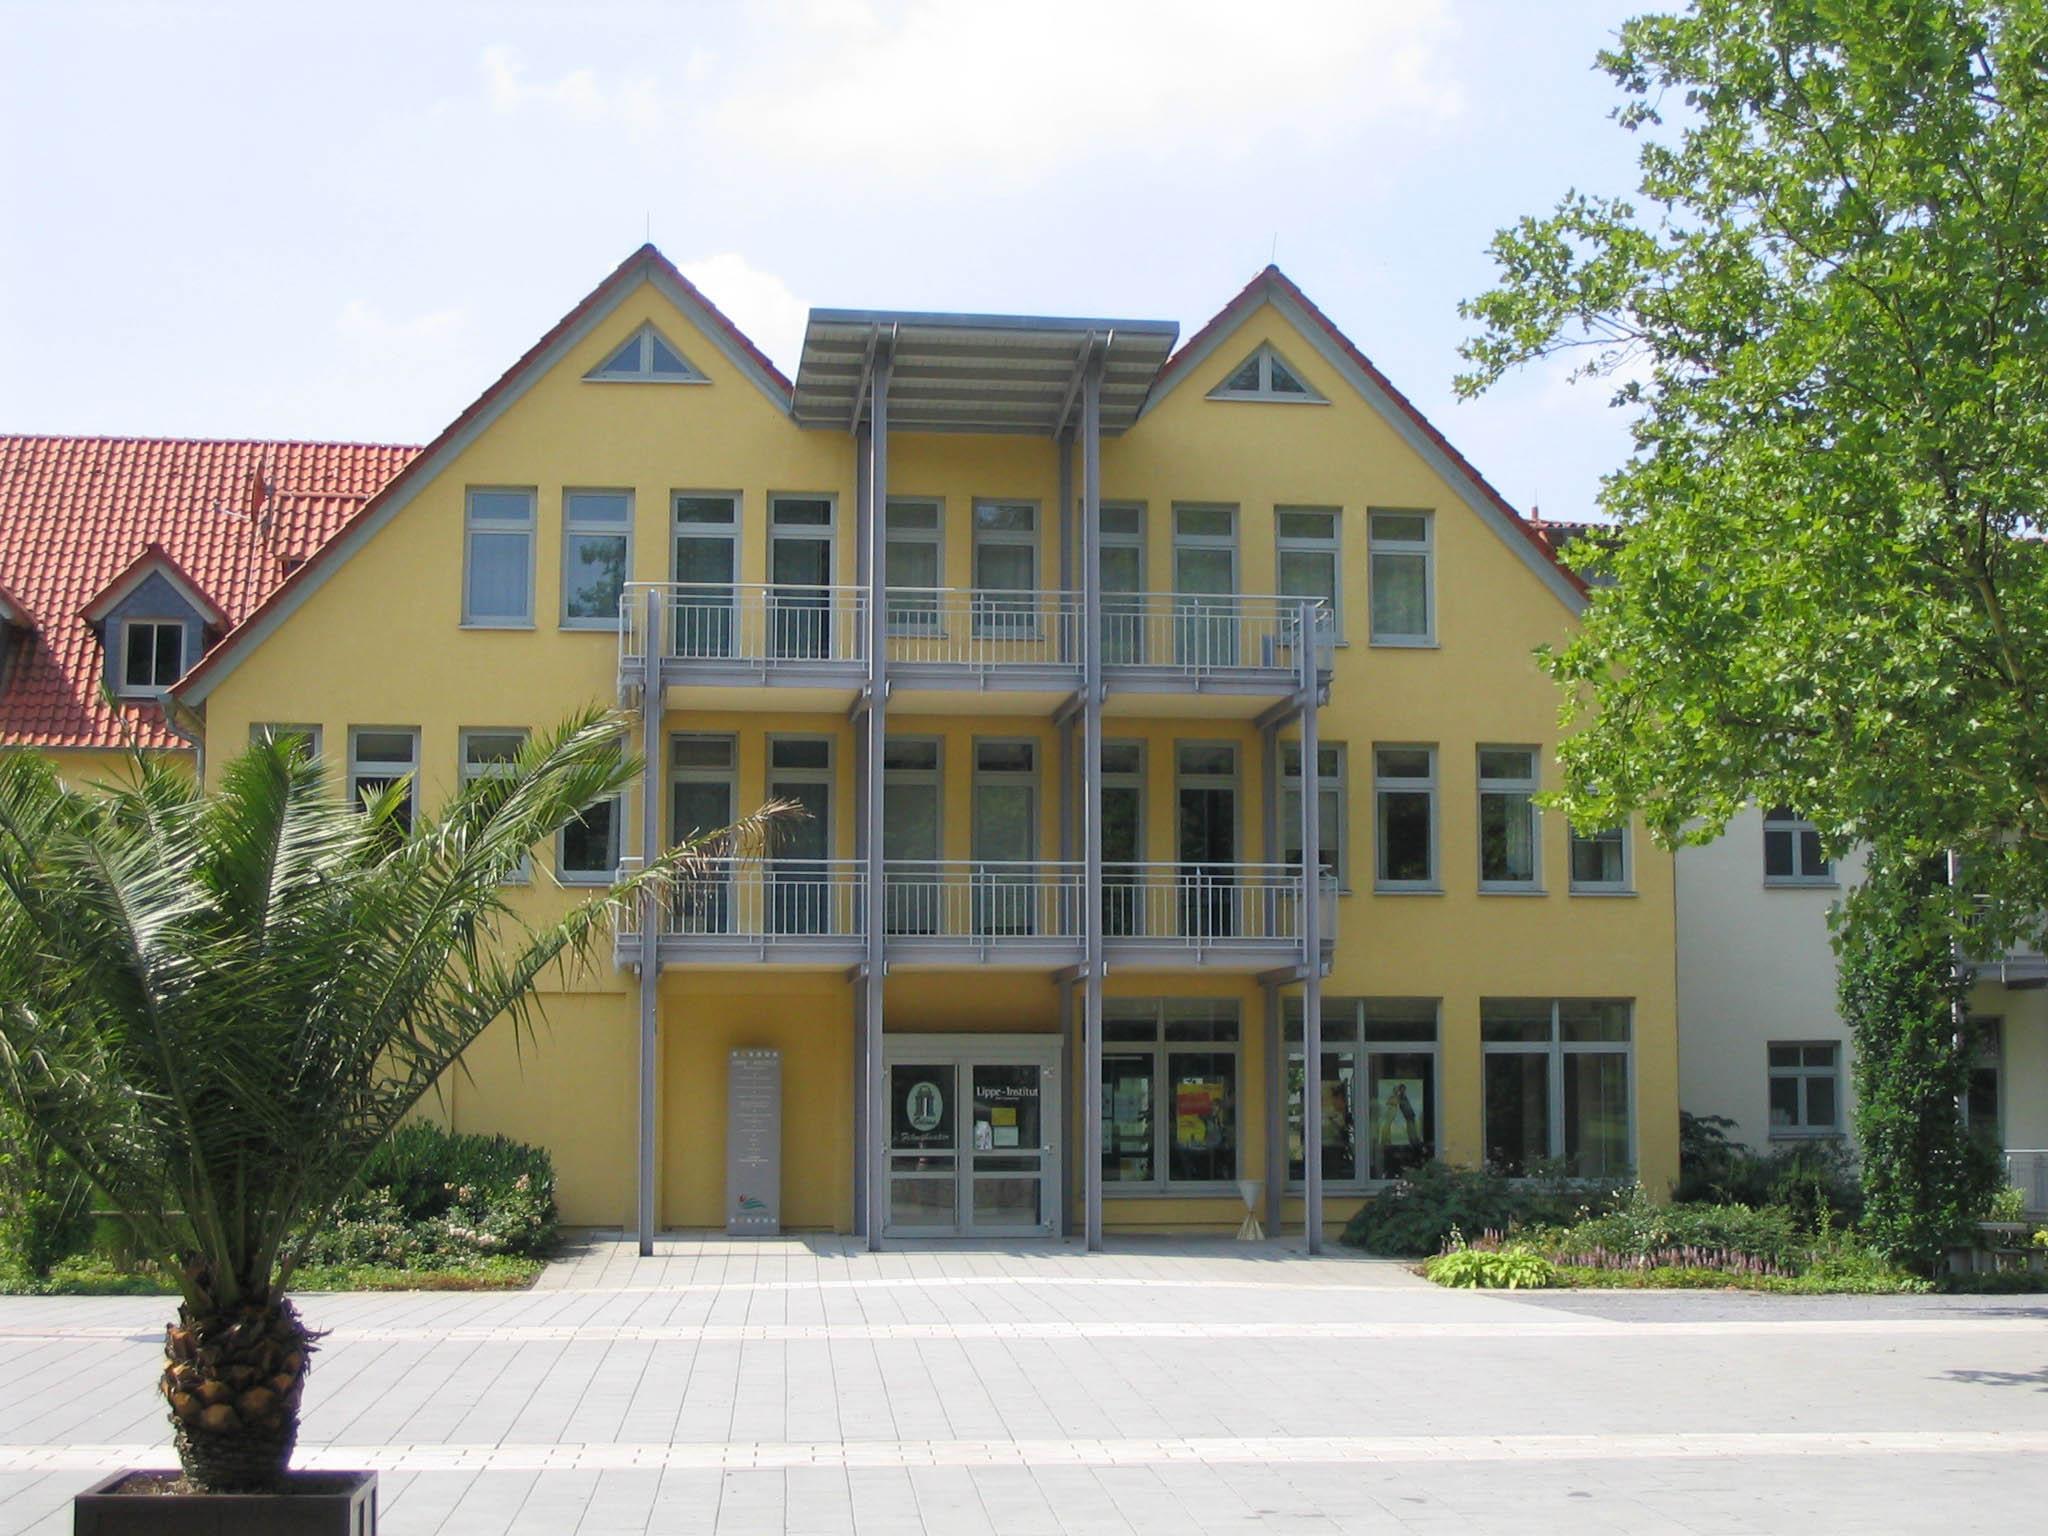 Odins Filmtheater im Lippe-Institut Bad Lippspringe